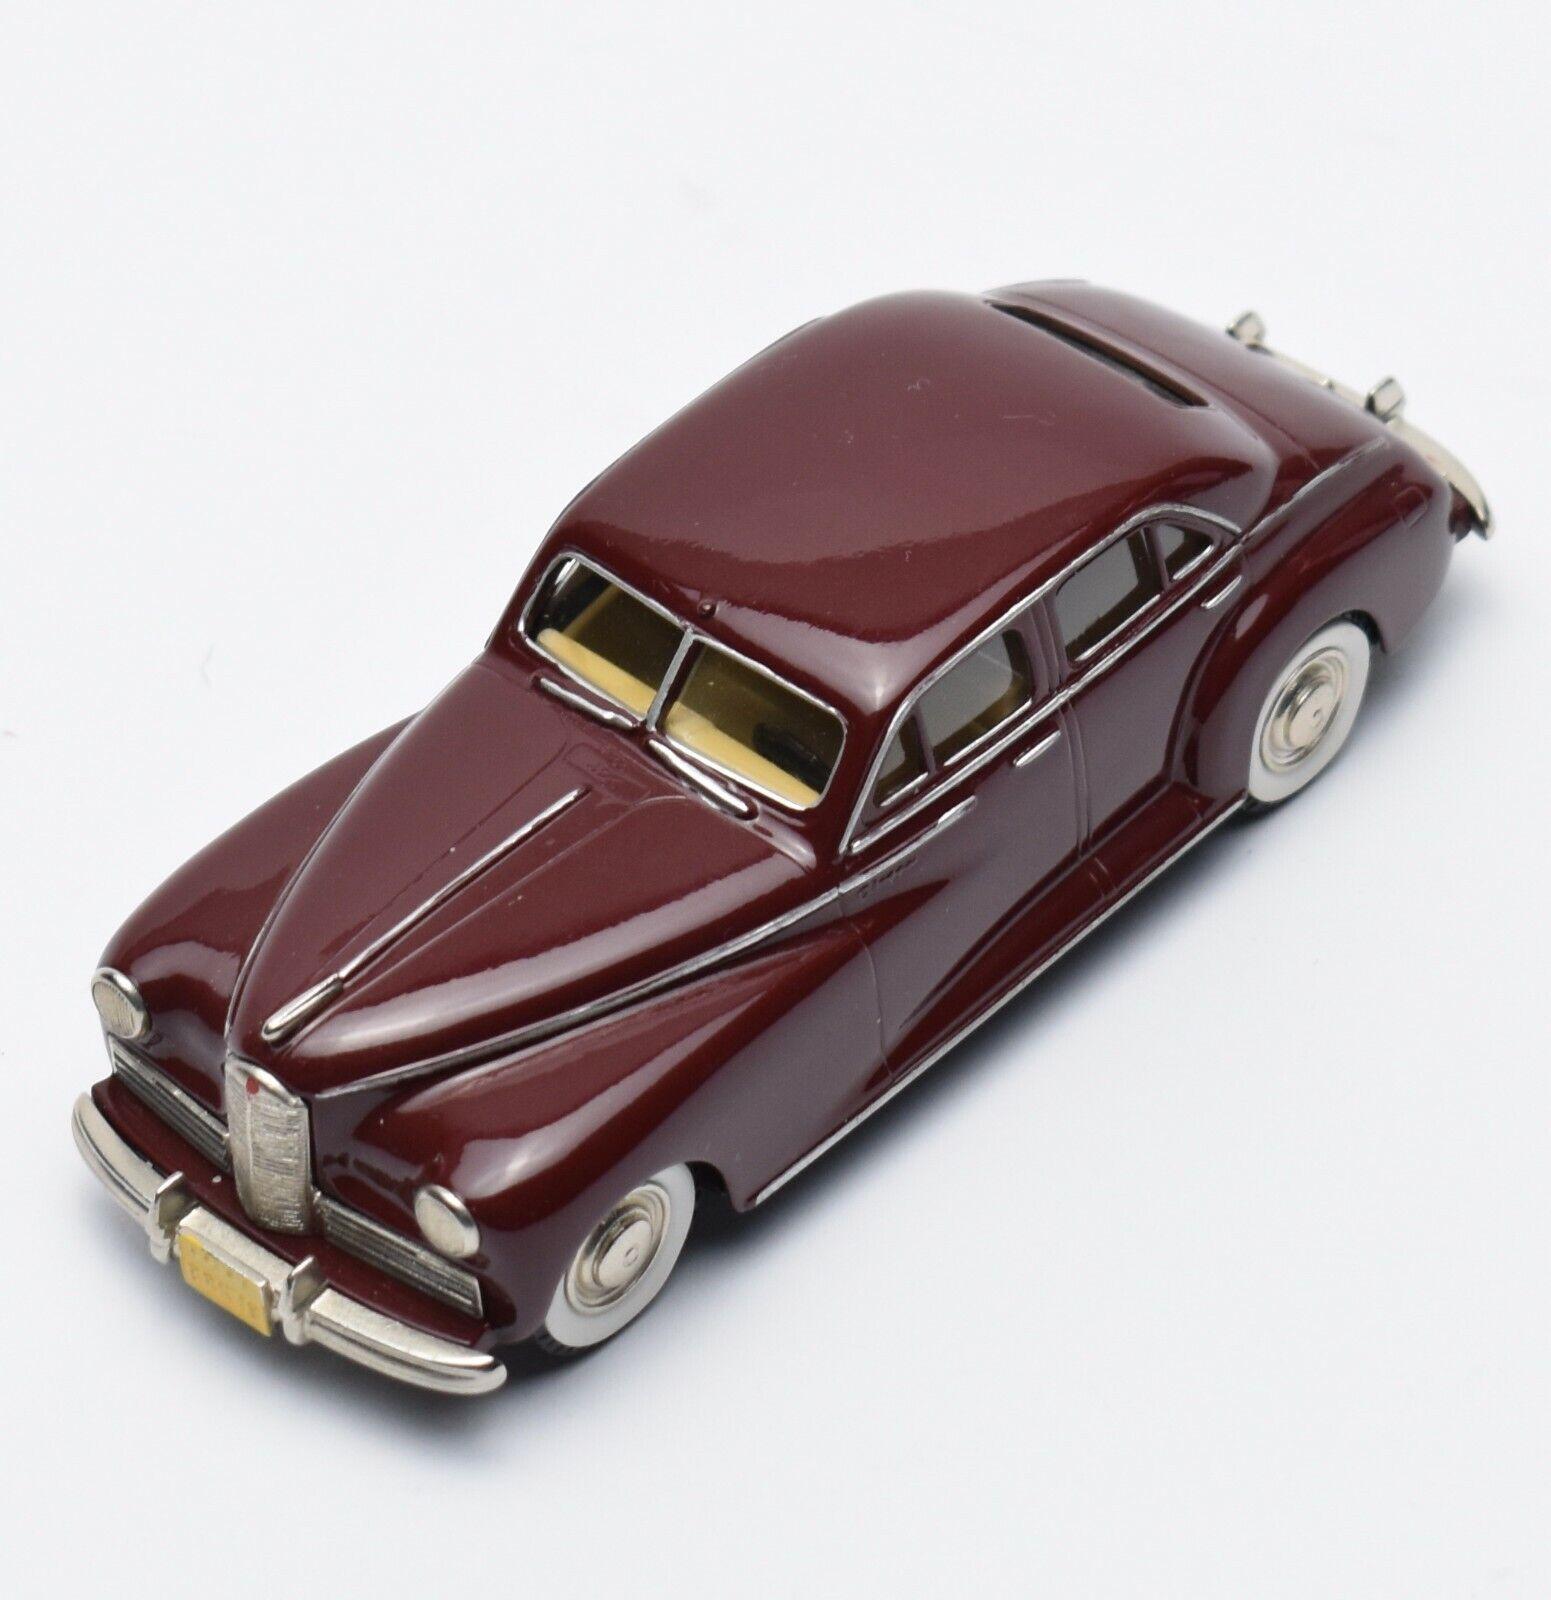 grandes precios de descuento Brooklin models rareza BRK 18 Packard Clipper Clipper Clipper año 1941 sedán, 1 43, v007  ganancia cero